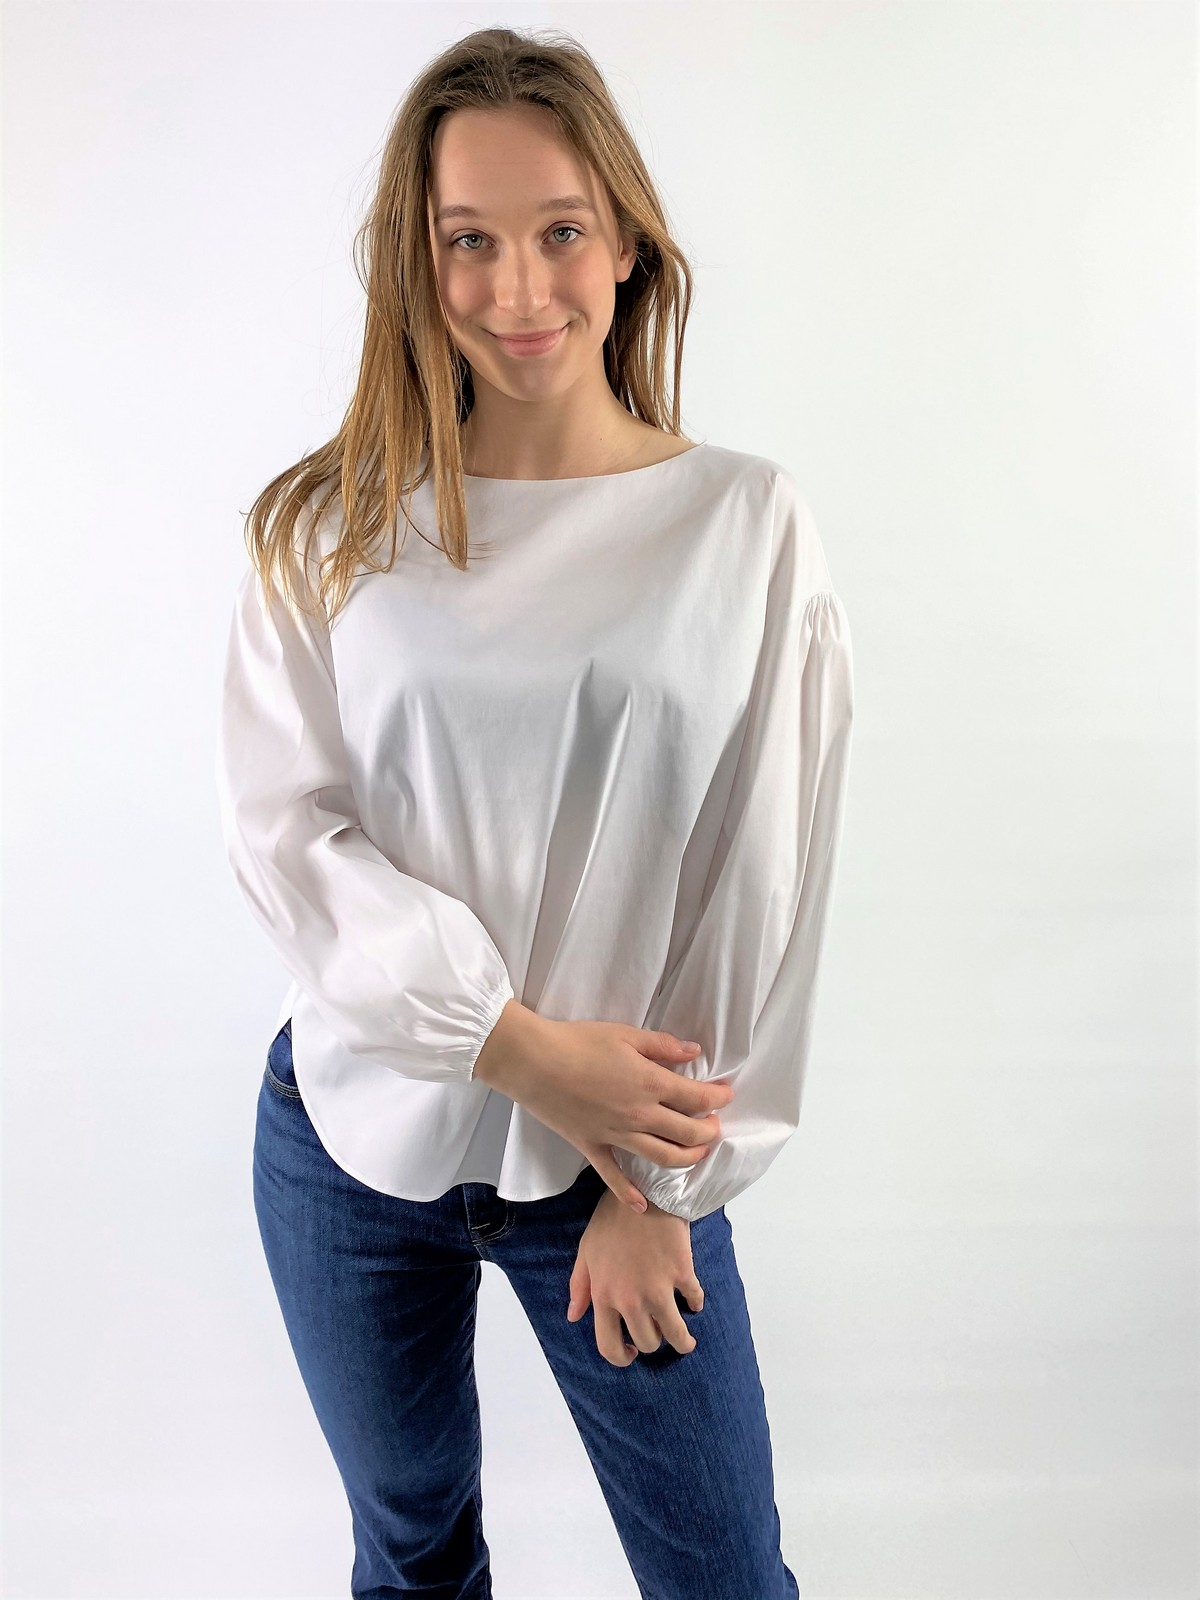 Shirtbloes pofmouwen - 21103 Cemala-5 - Hemisphere